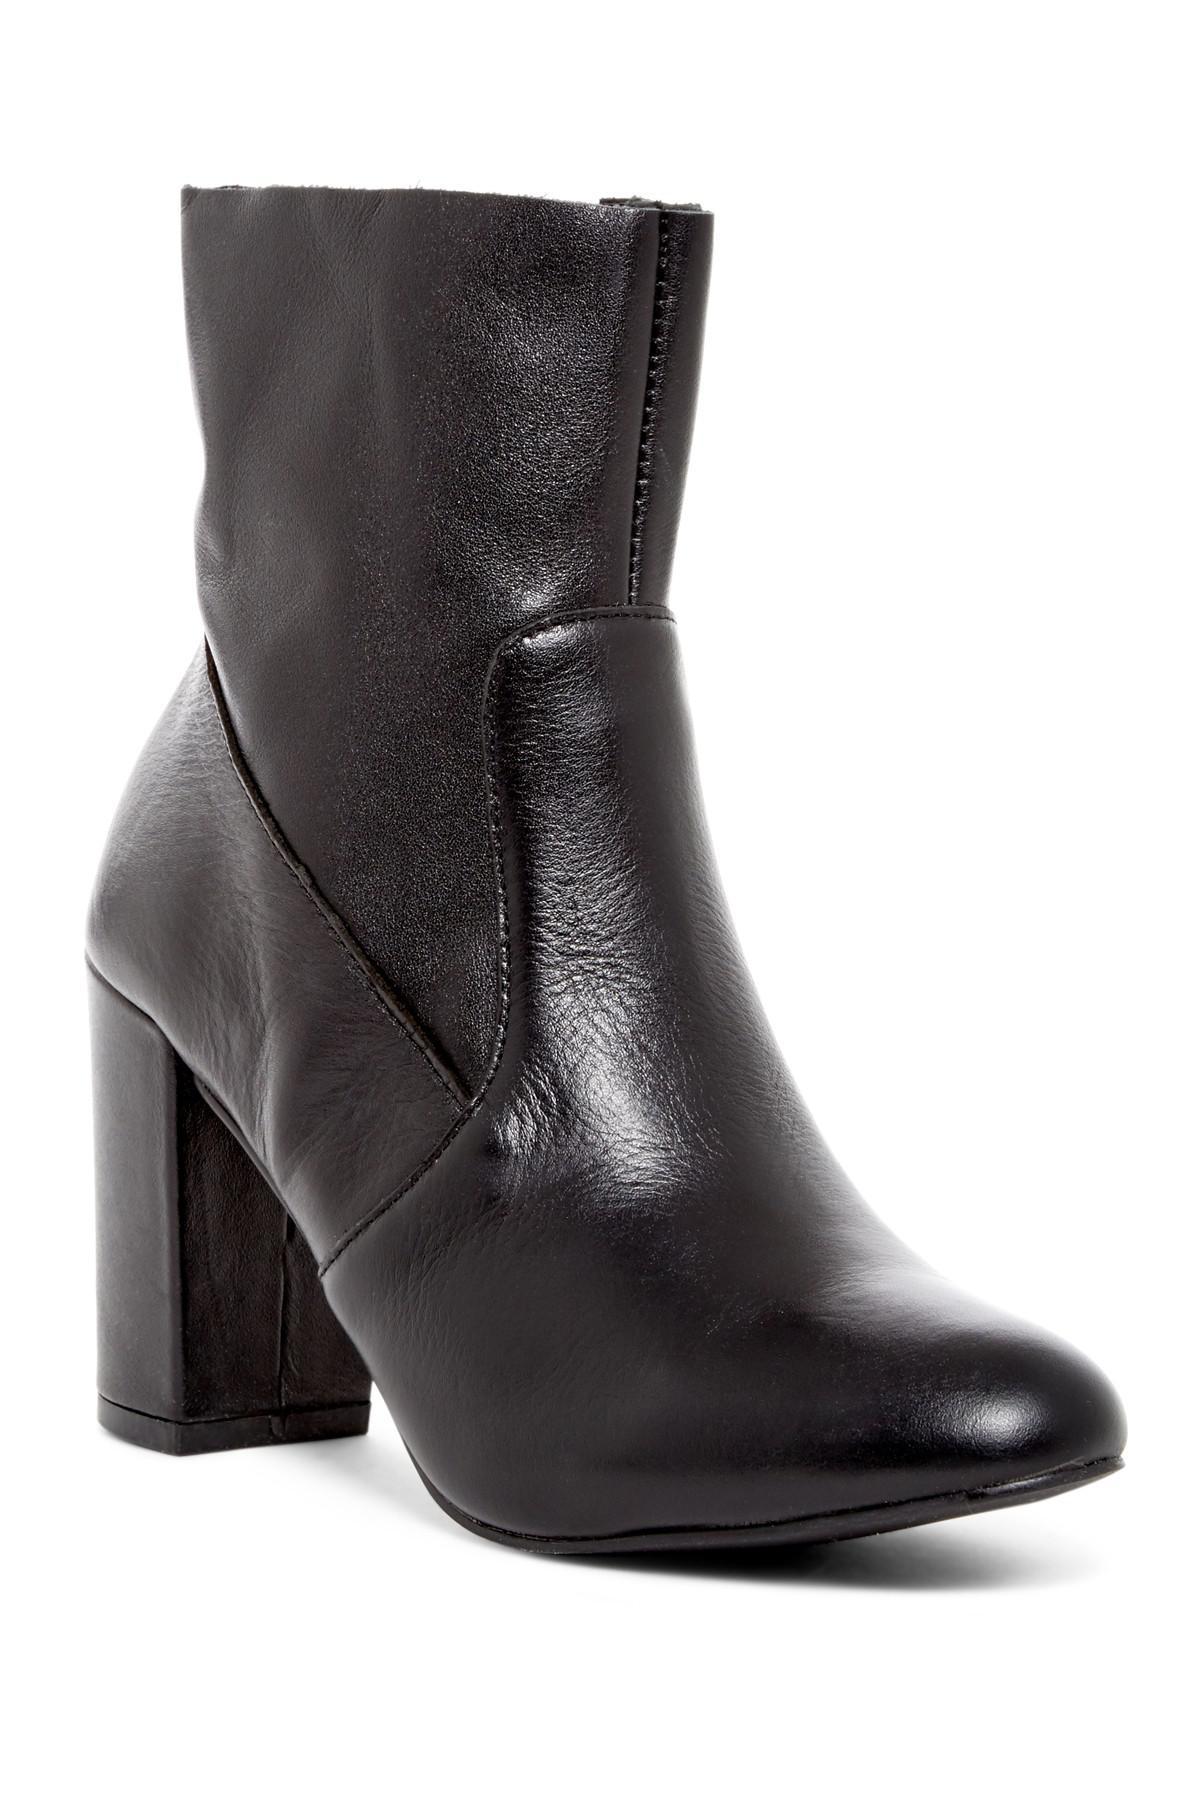 Steve Madden. Women's Black Miranda Leather Bootie